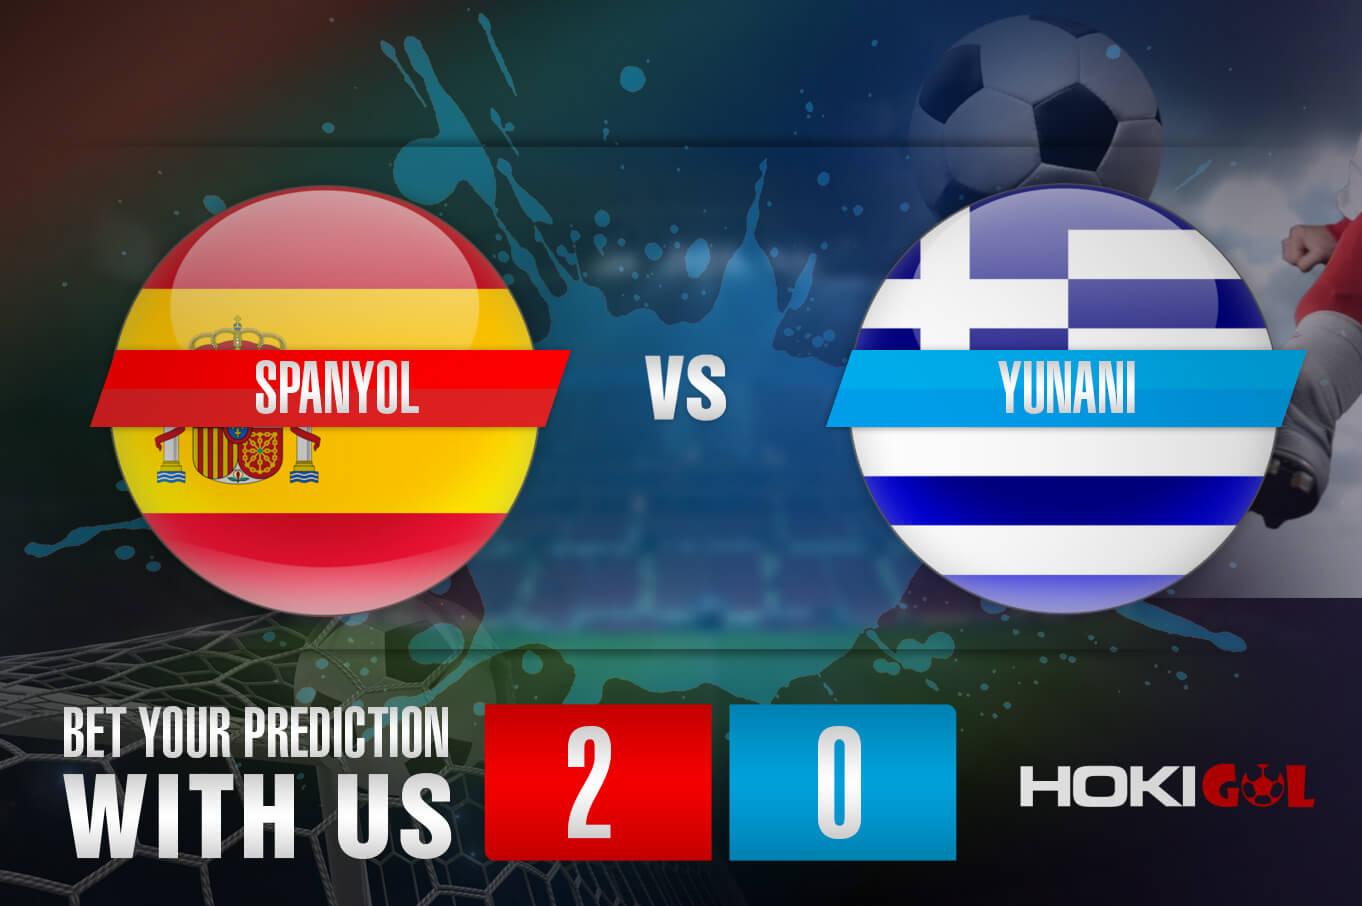 Prediksi Bola Spanyol Vs Yunani 26 Maret 2021